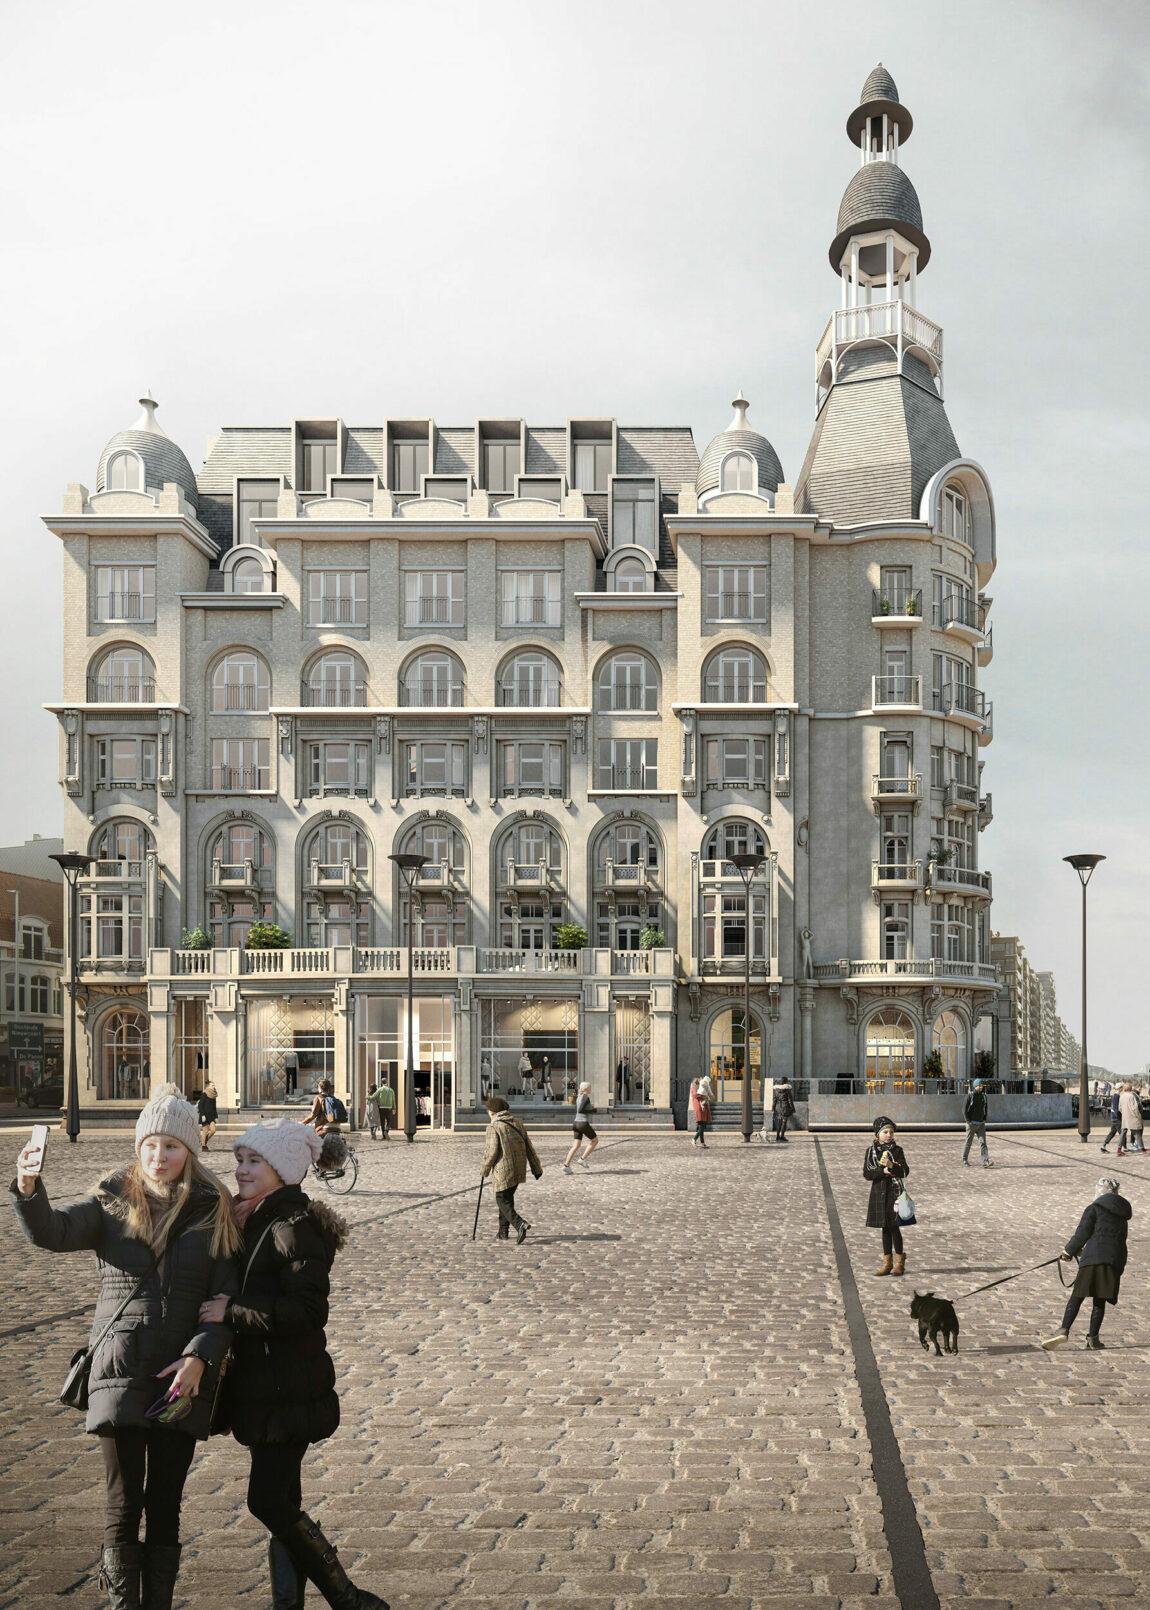 P1509 VDD The Grand Nieuwpoort Cam Old Time Square HR 20201218